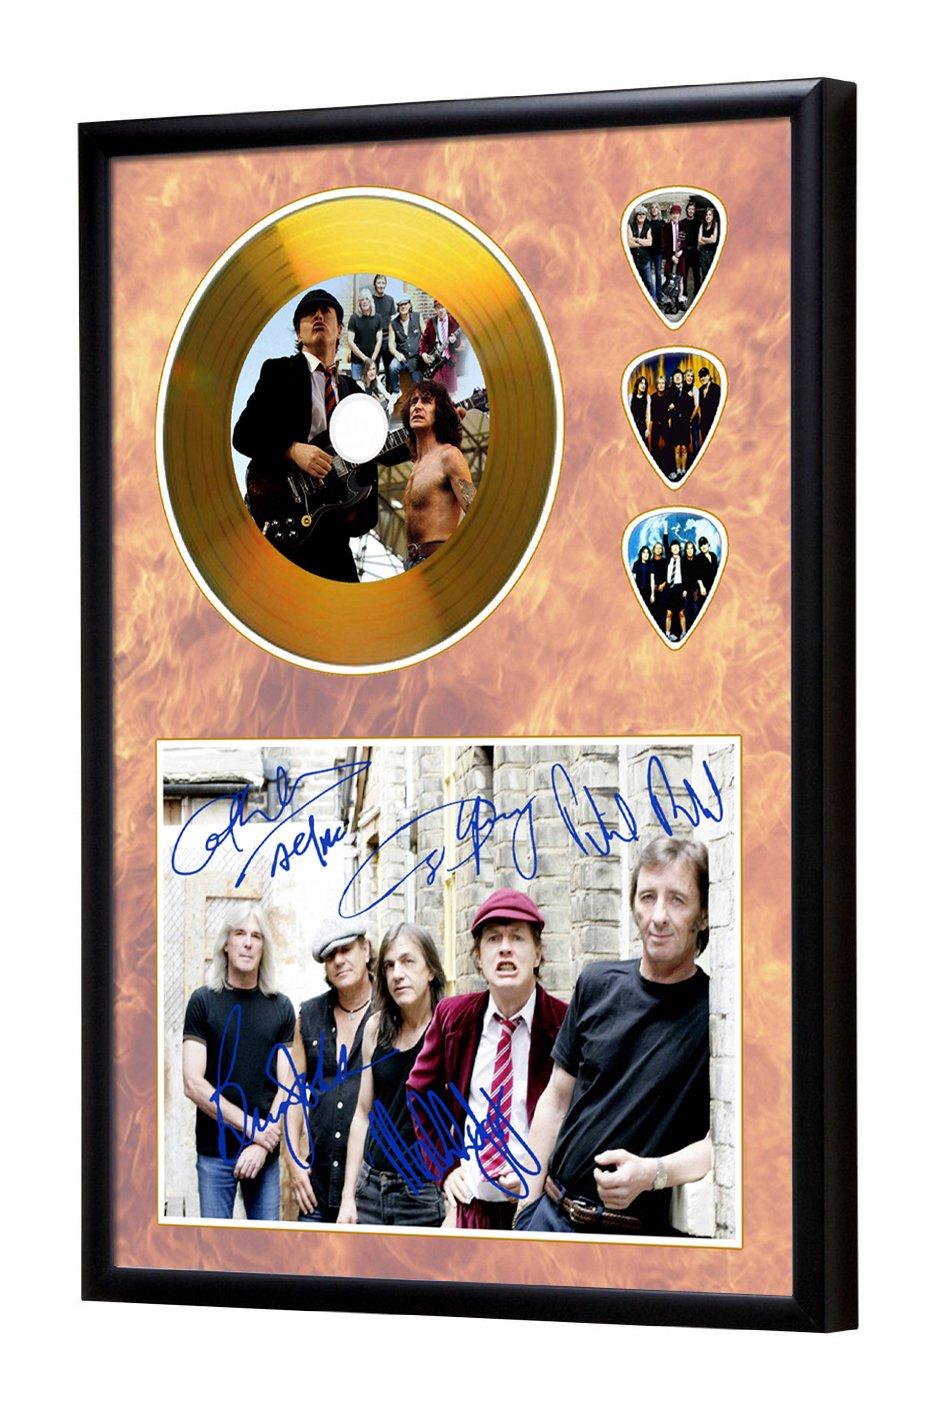 ACDC Gerahmte CD Gold Disc Display & Plektren (A4) We Love Guitars